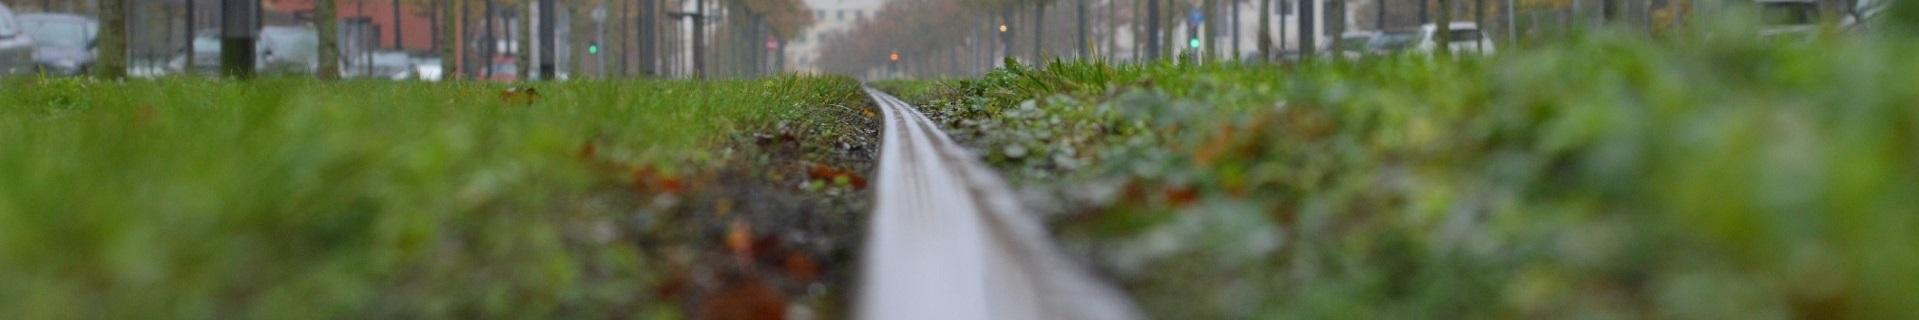 Rasengleis bei Regen, Bahntechnik, Bahnbetrieb